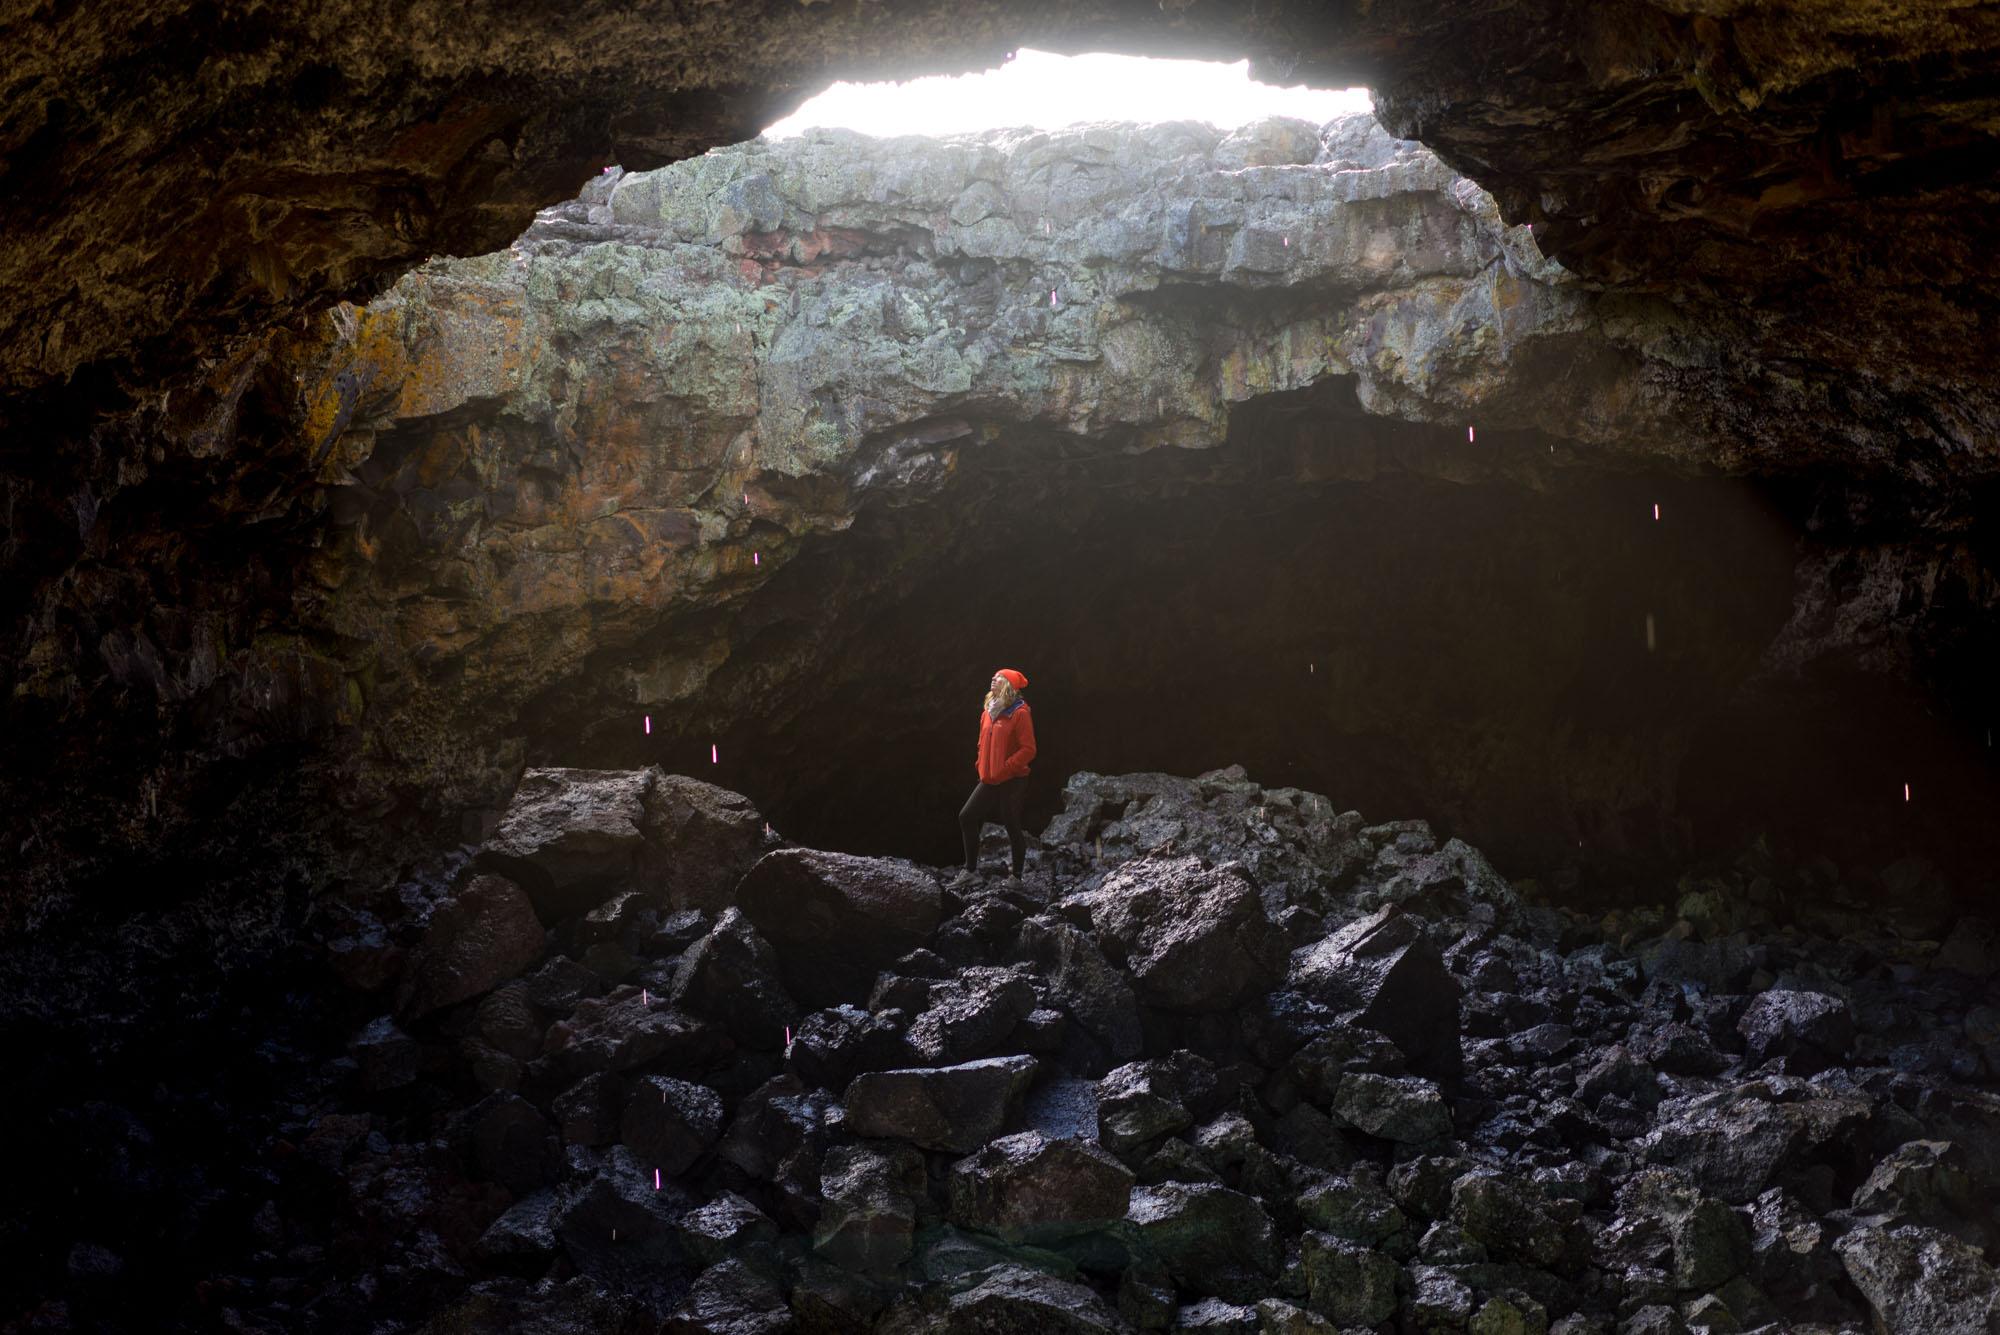 Indian Cave, Lava tube